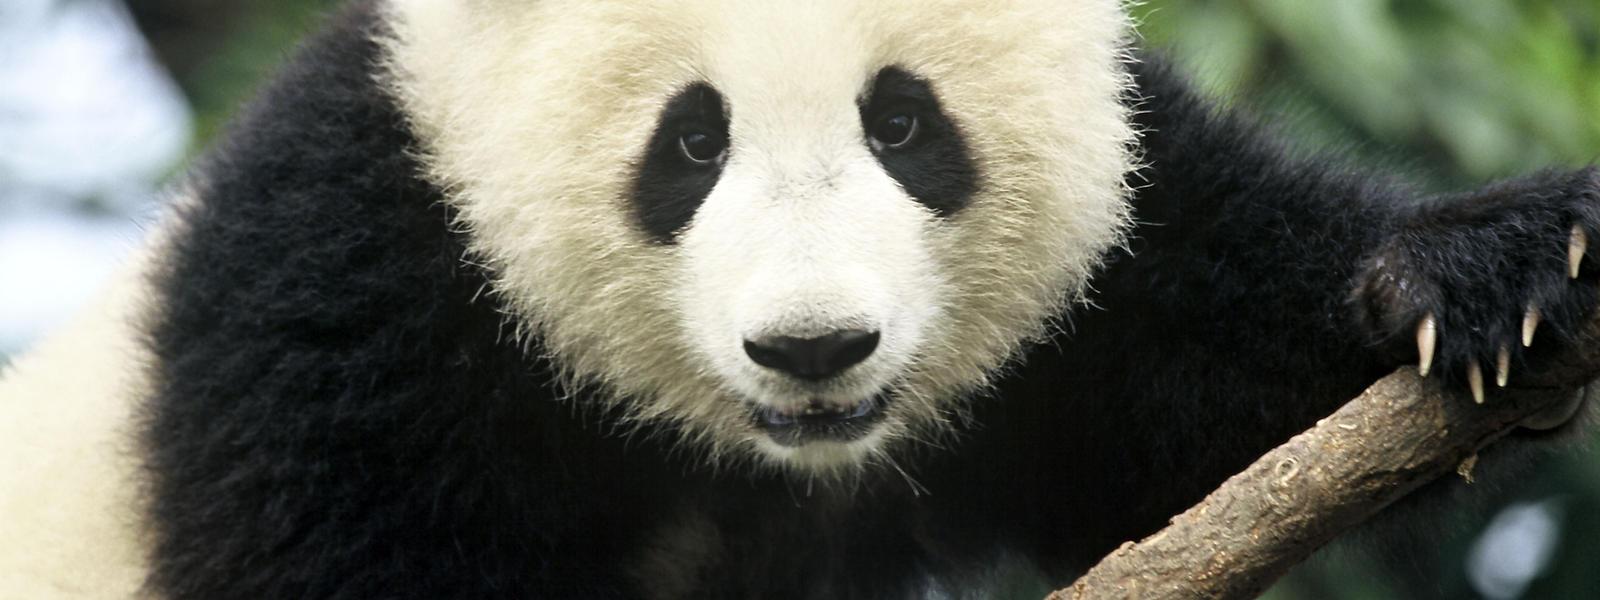 Giant_Panda_Hero_image_(c)_Michel_Gunther_WWF_Canon.jpg?1345515244